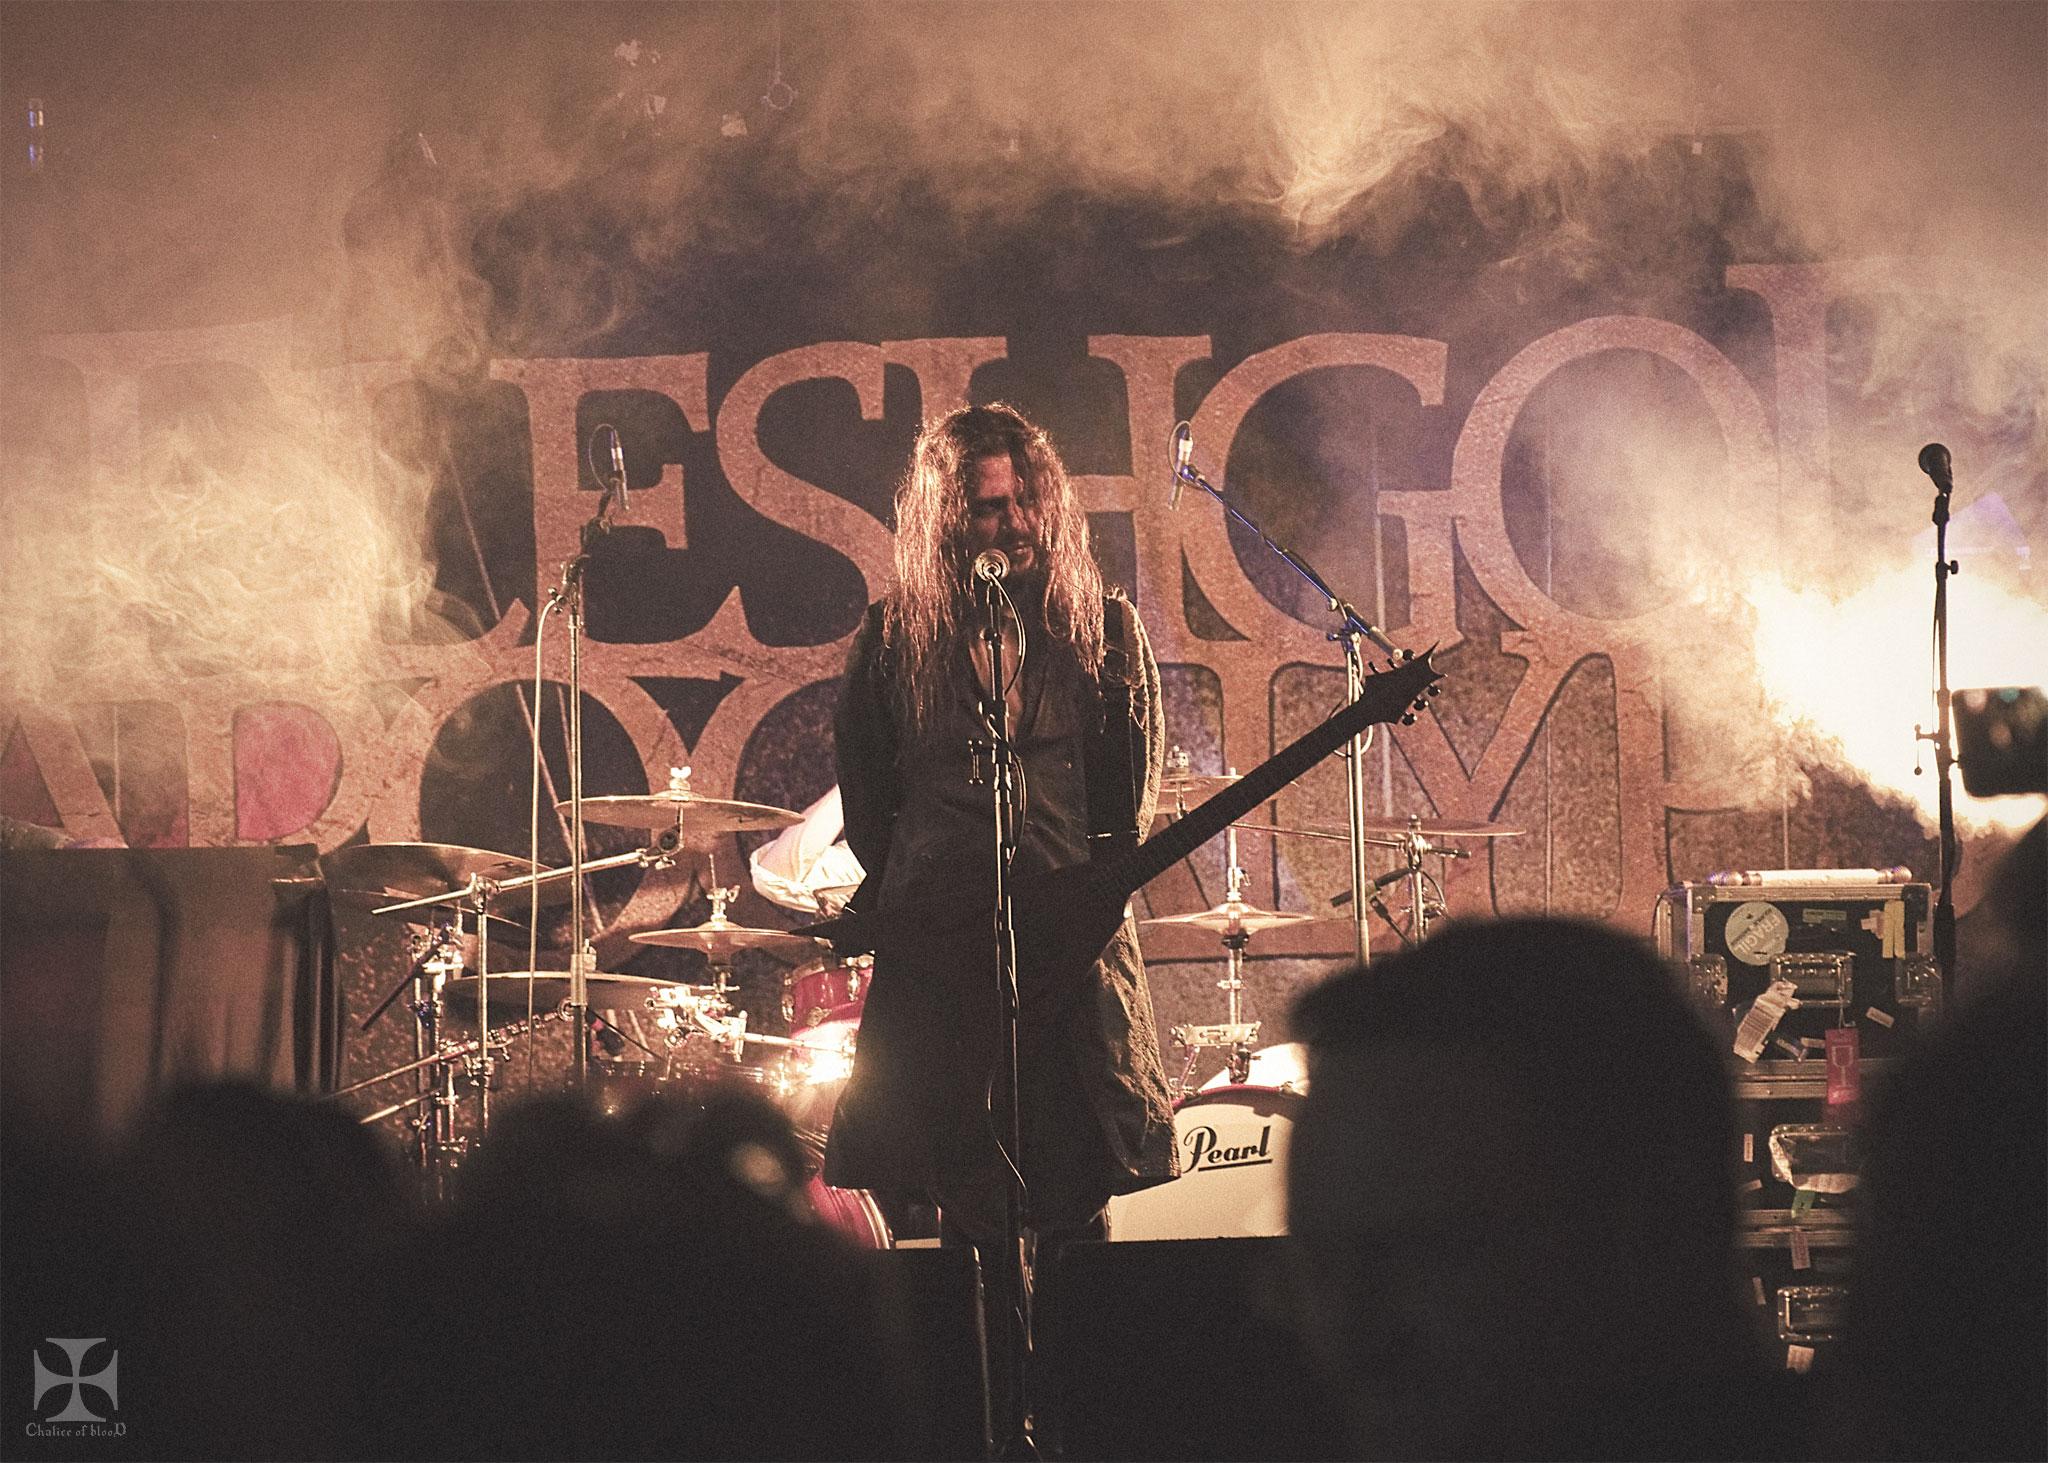 Fleshgod-Apocalypse-0540-Exposure-watermarked.jpg